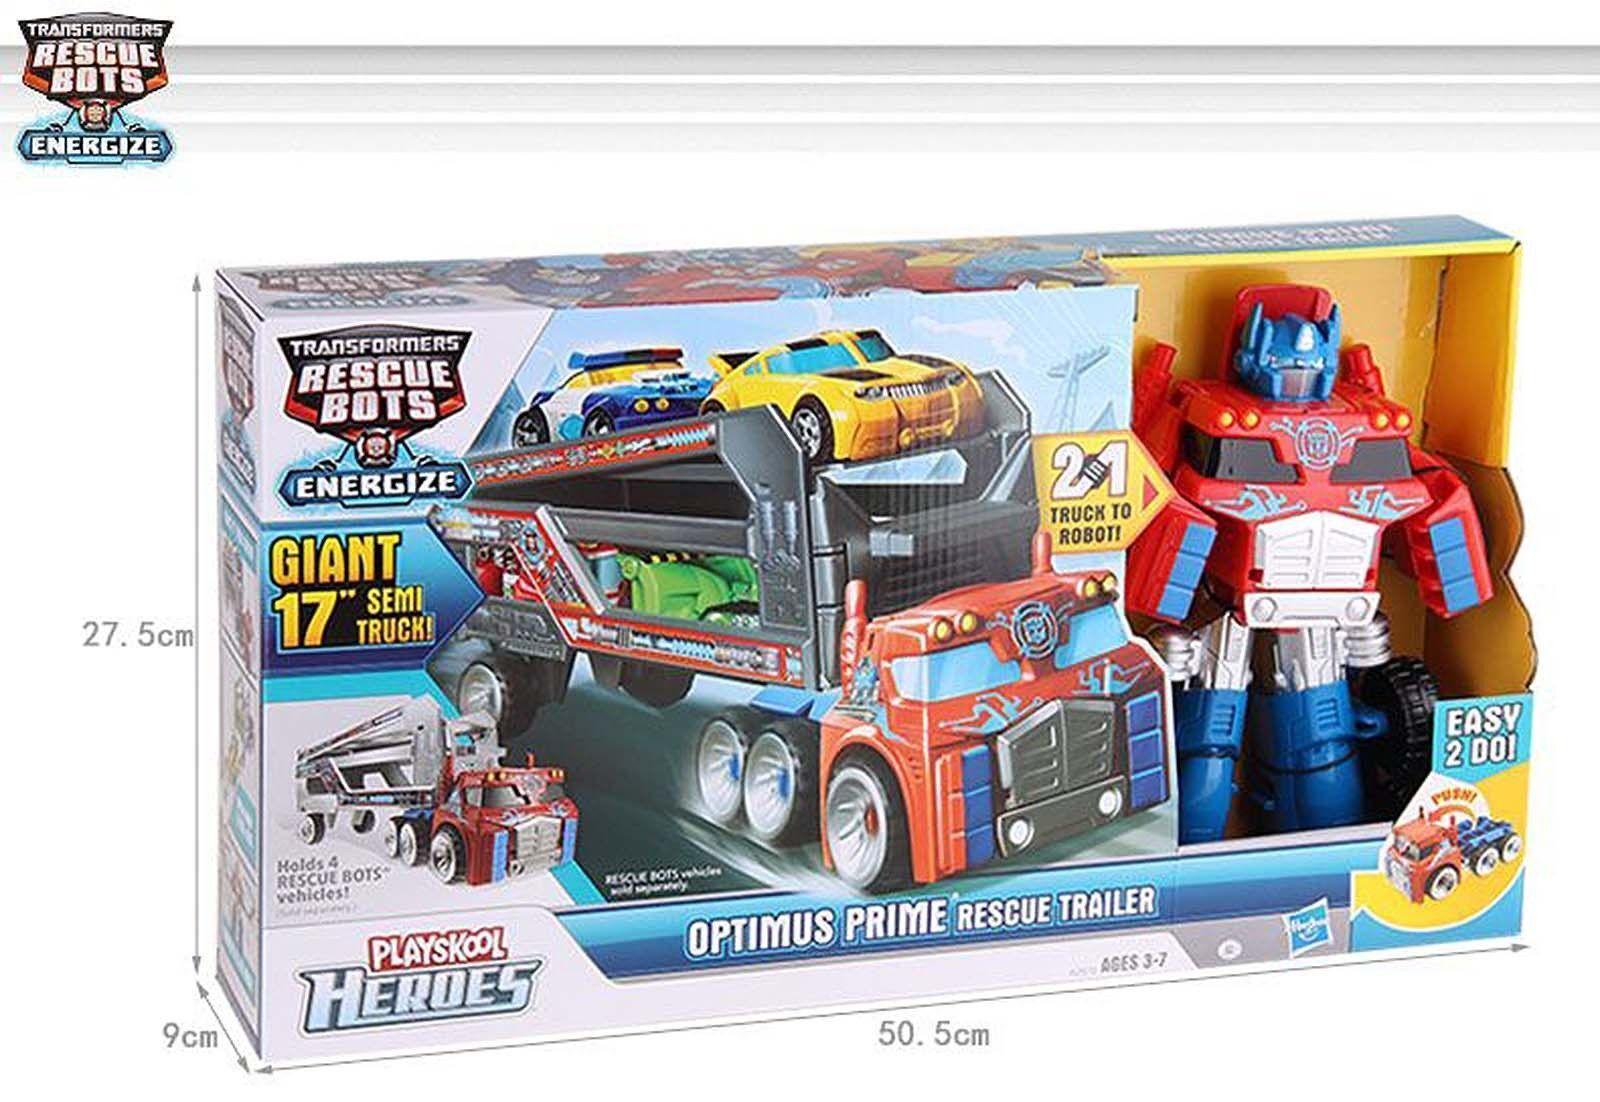 Transformers Playskool Heroes Rescue Bots OPTIMUS PRIME PRIME PRIME RESCUE TRAILER Kids 8e121b